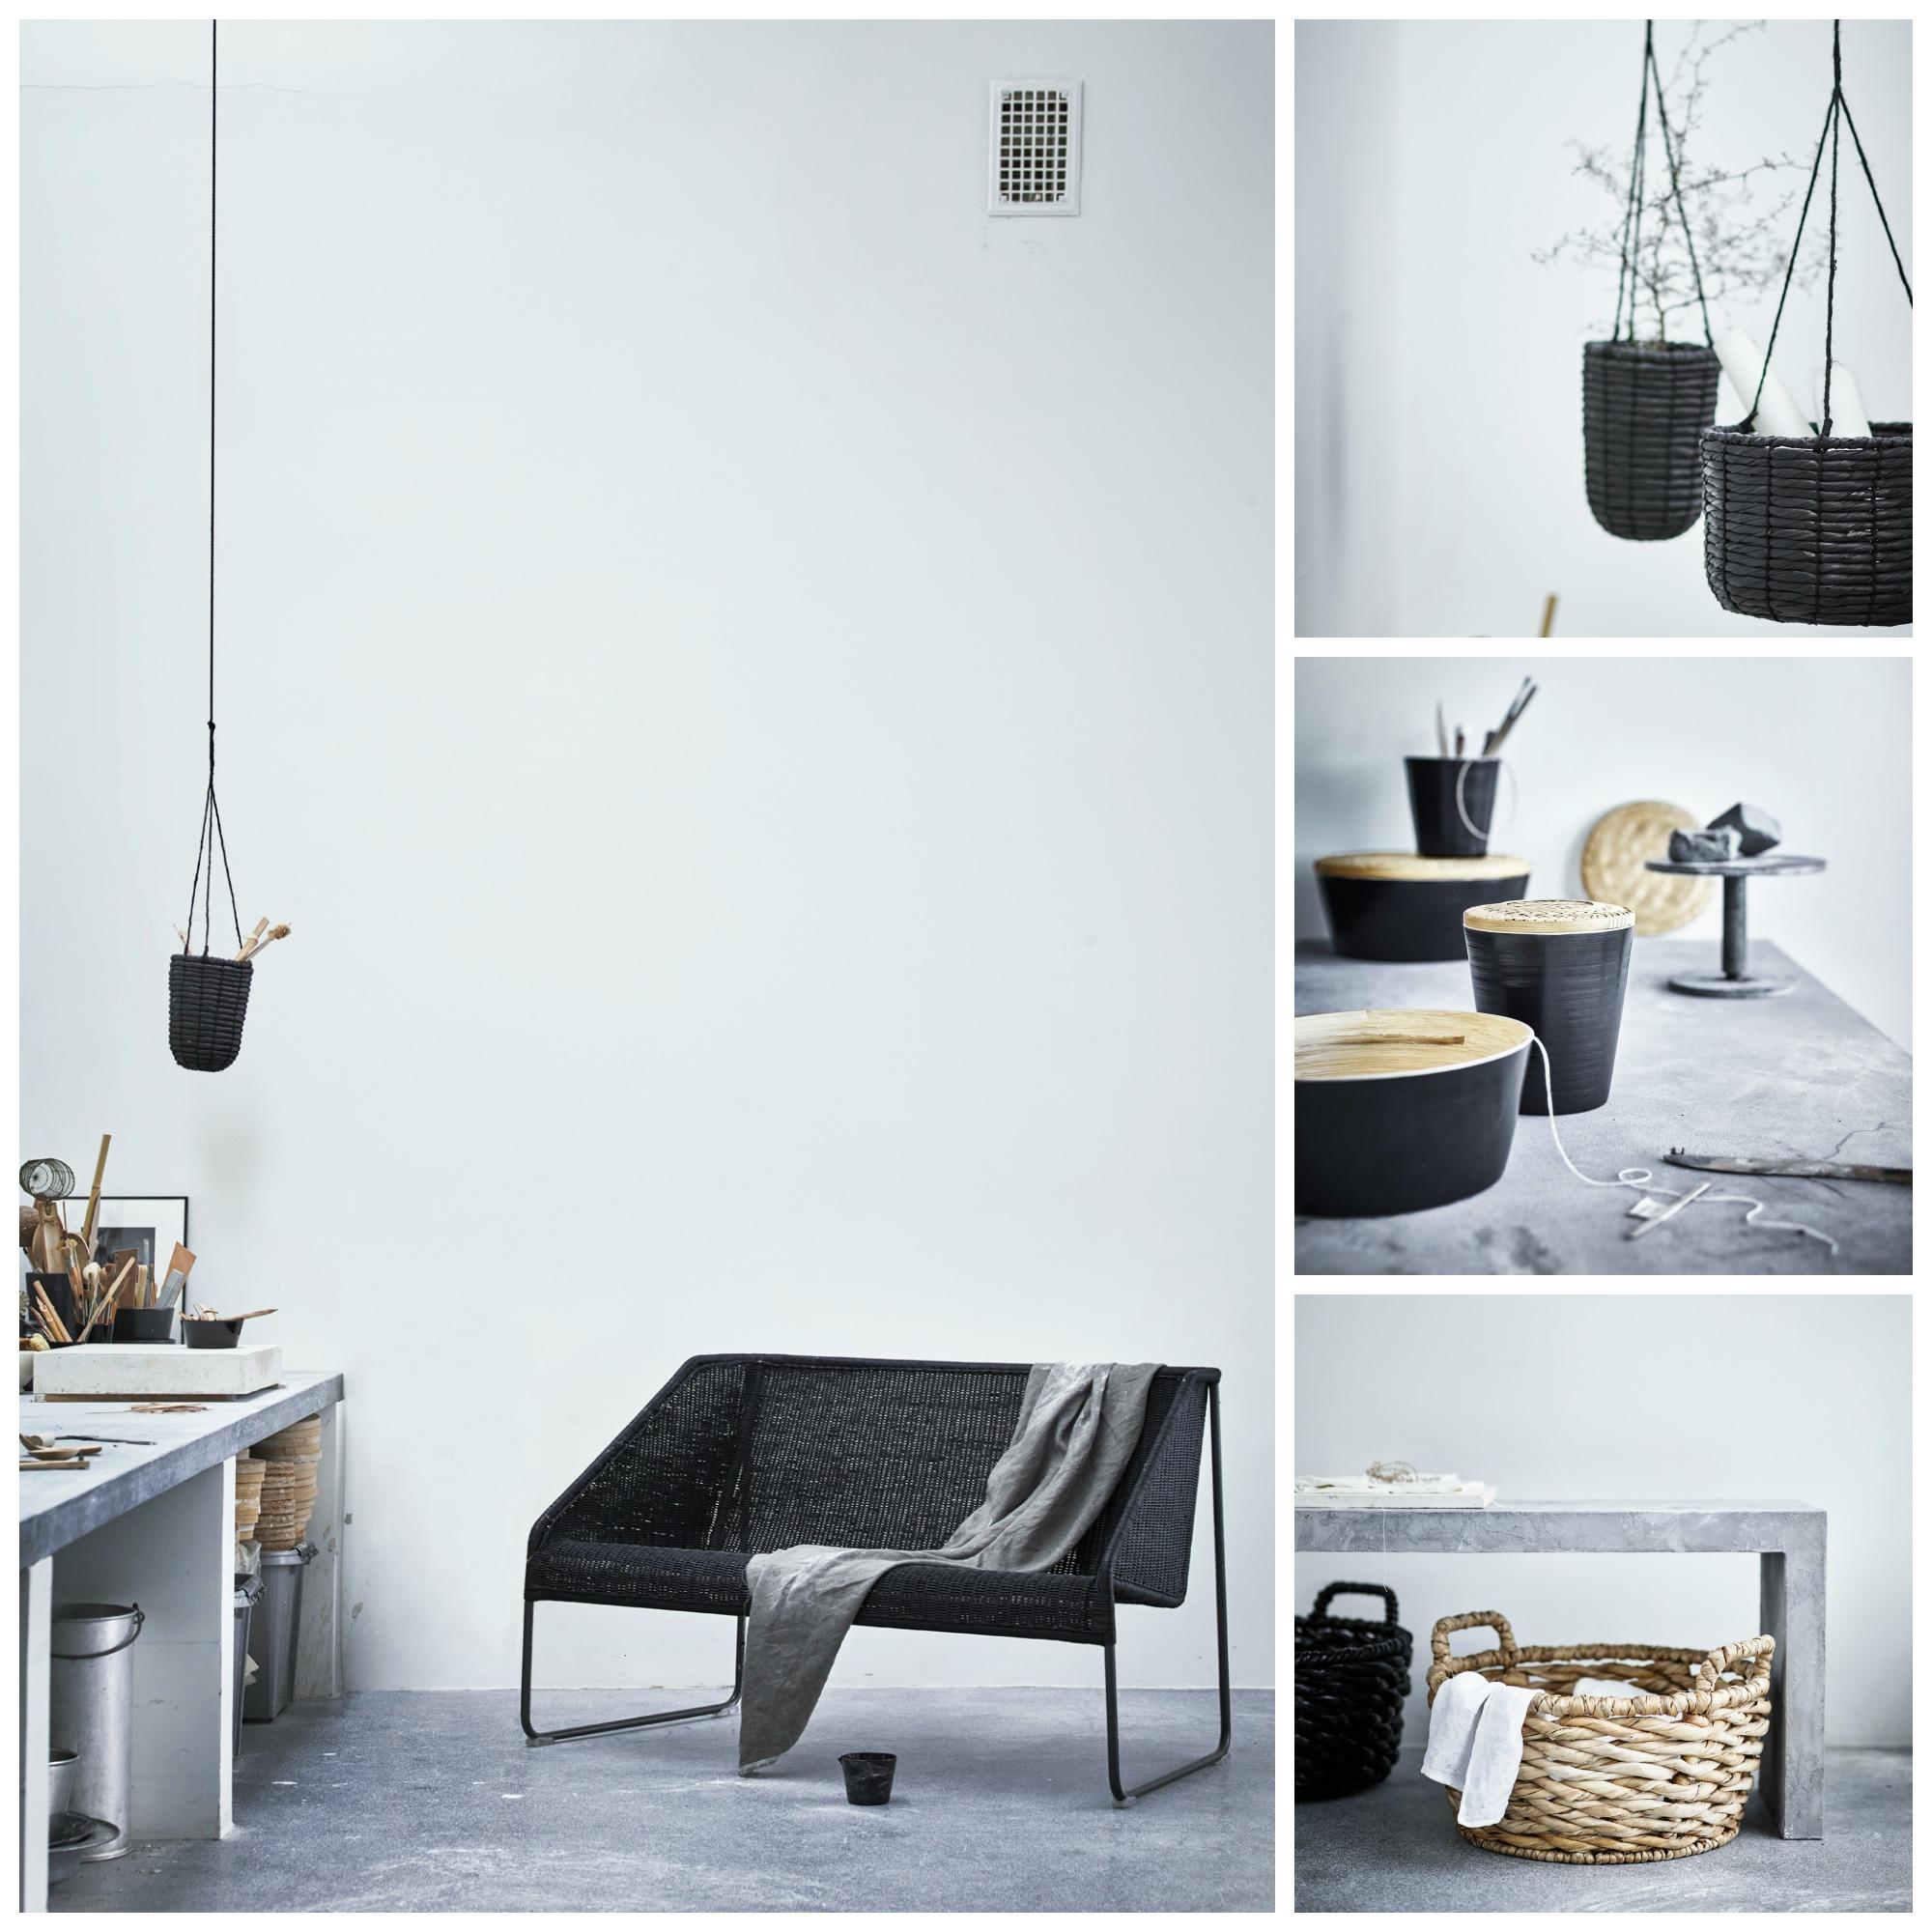 Ikea VIKTIGT 2